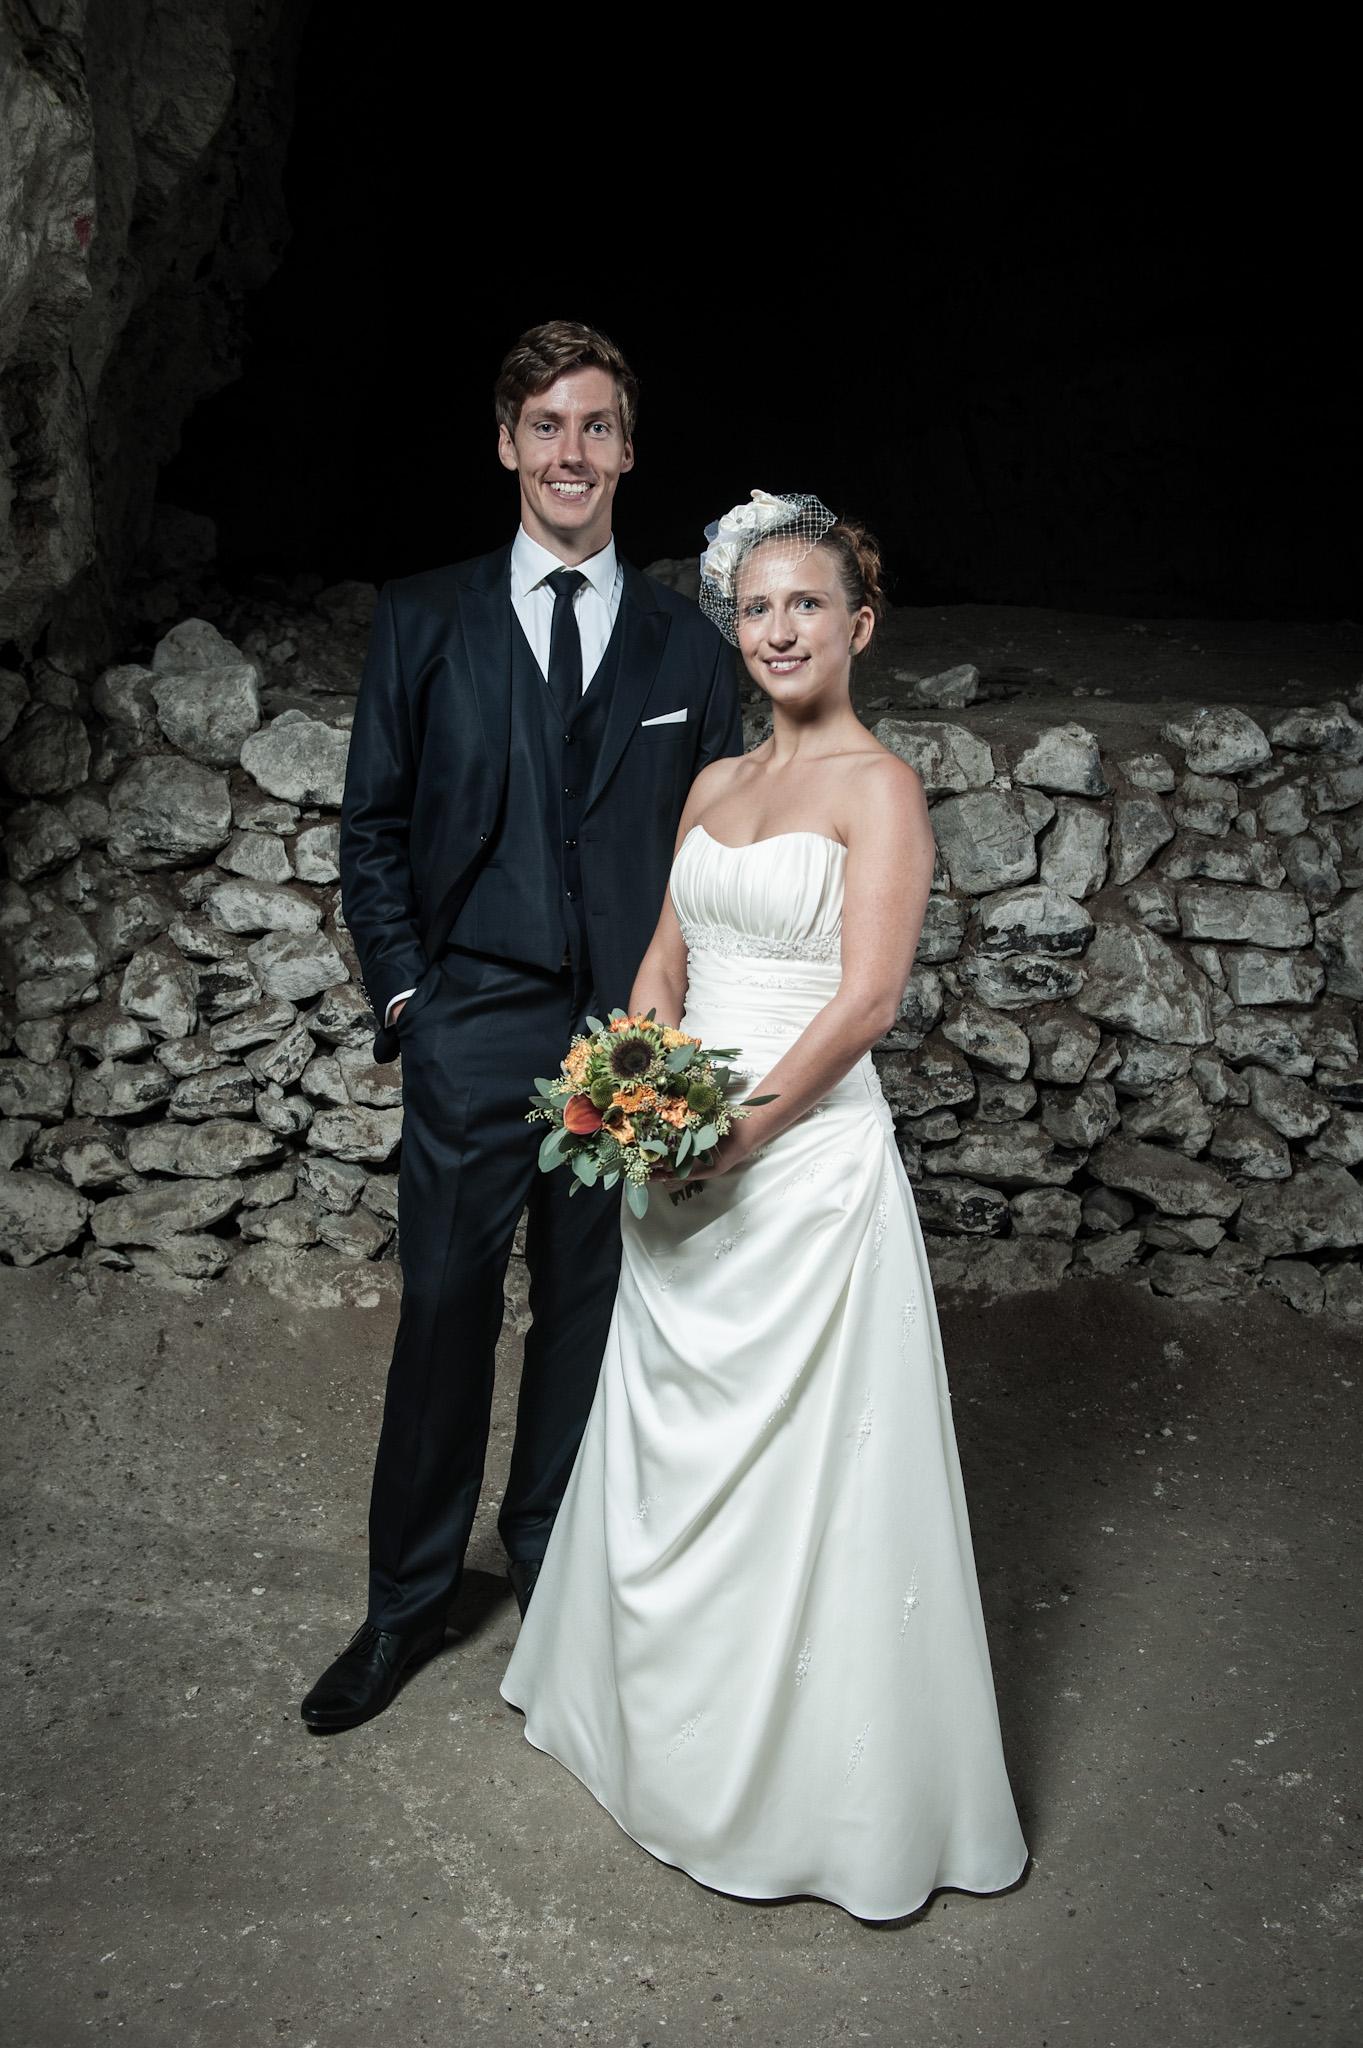 Bryllup_Vibeke_Pedersen_33